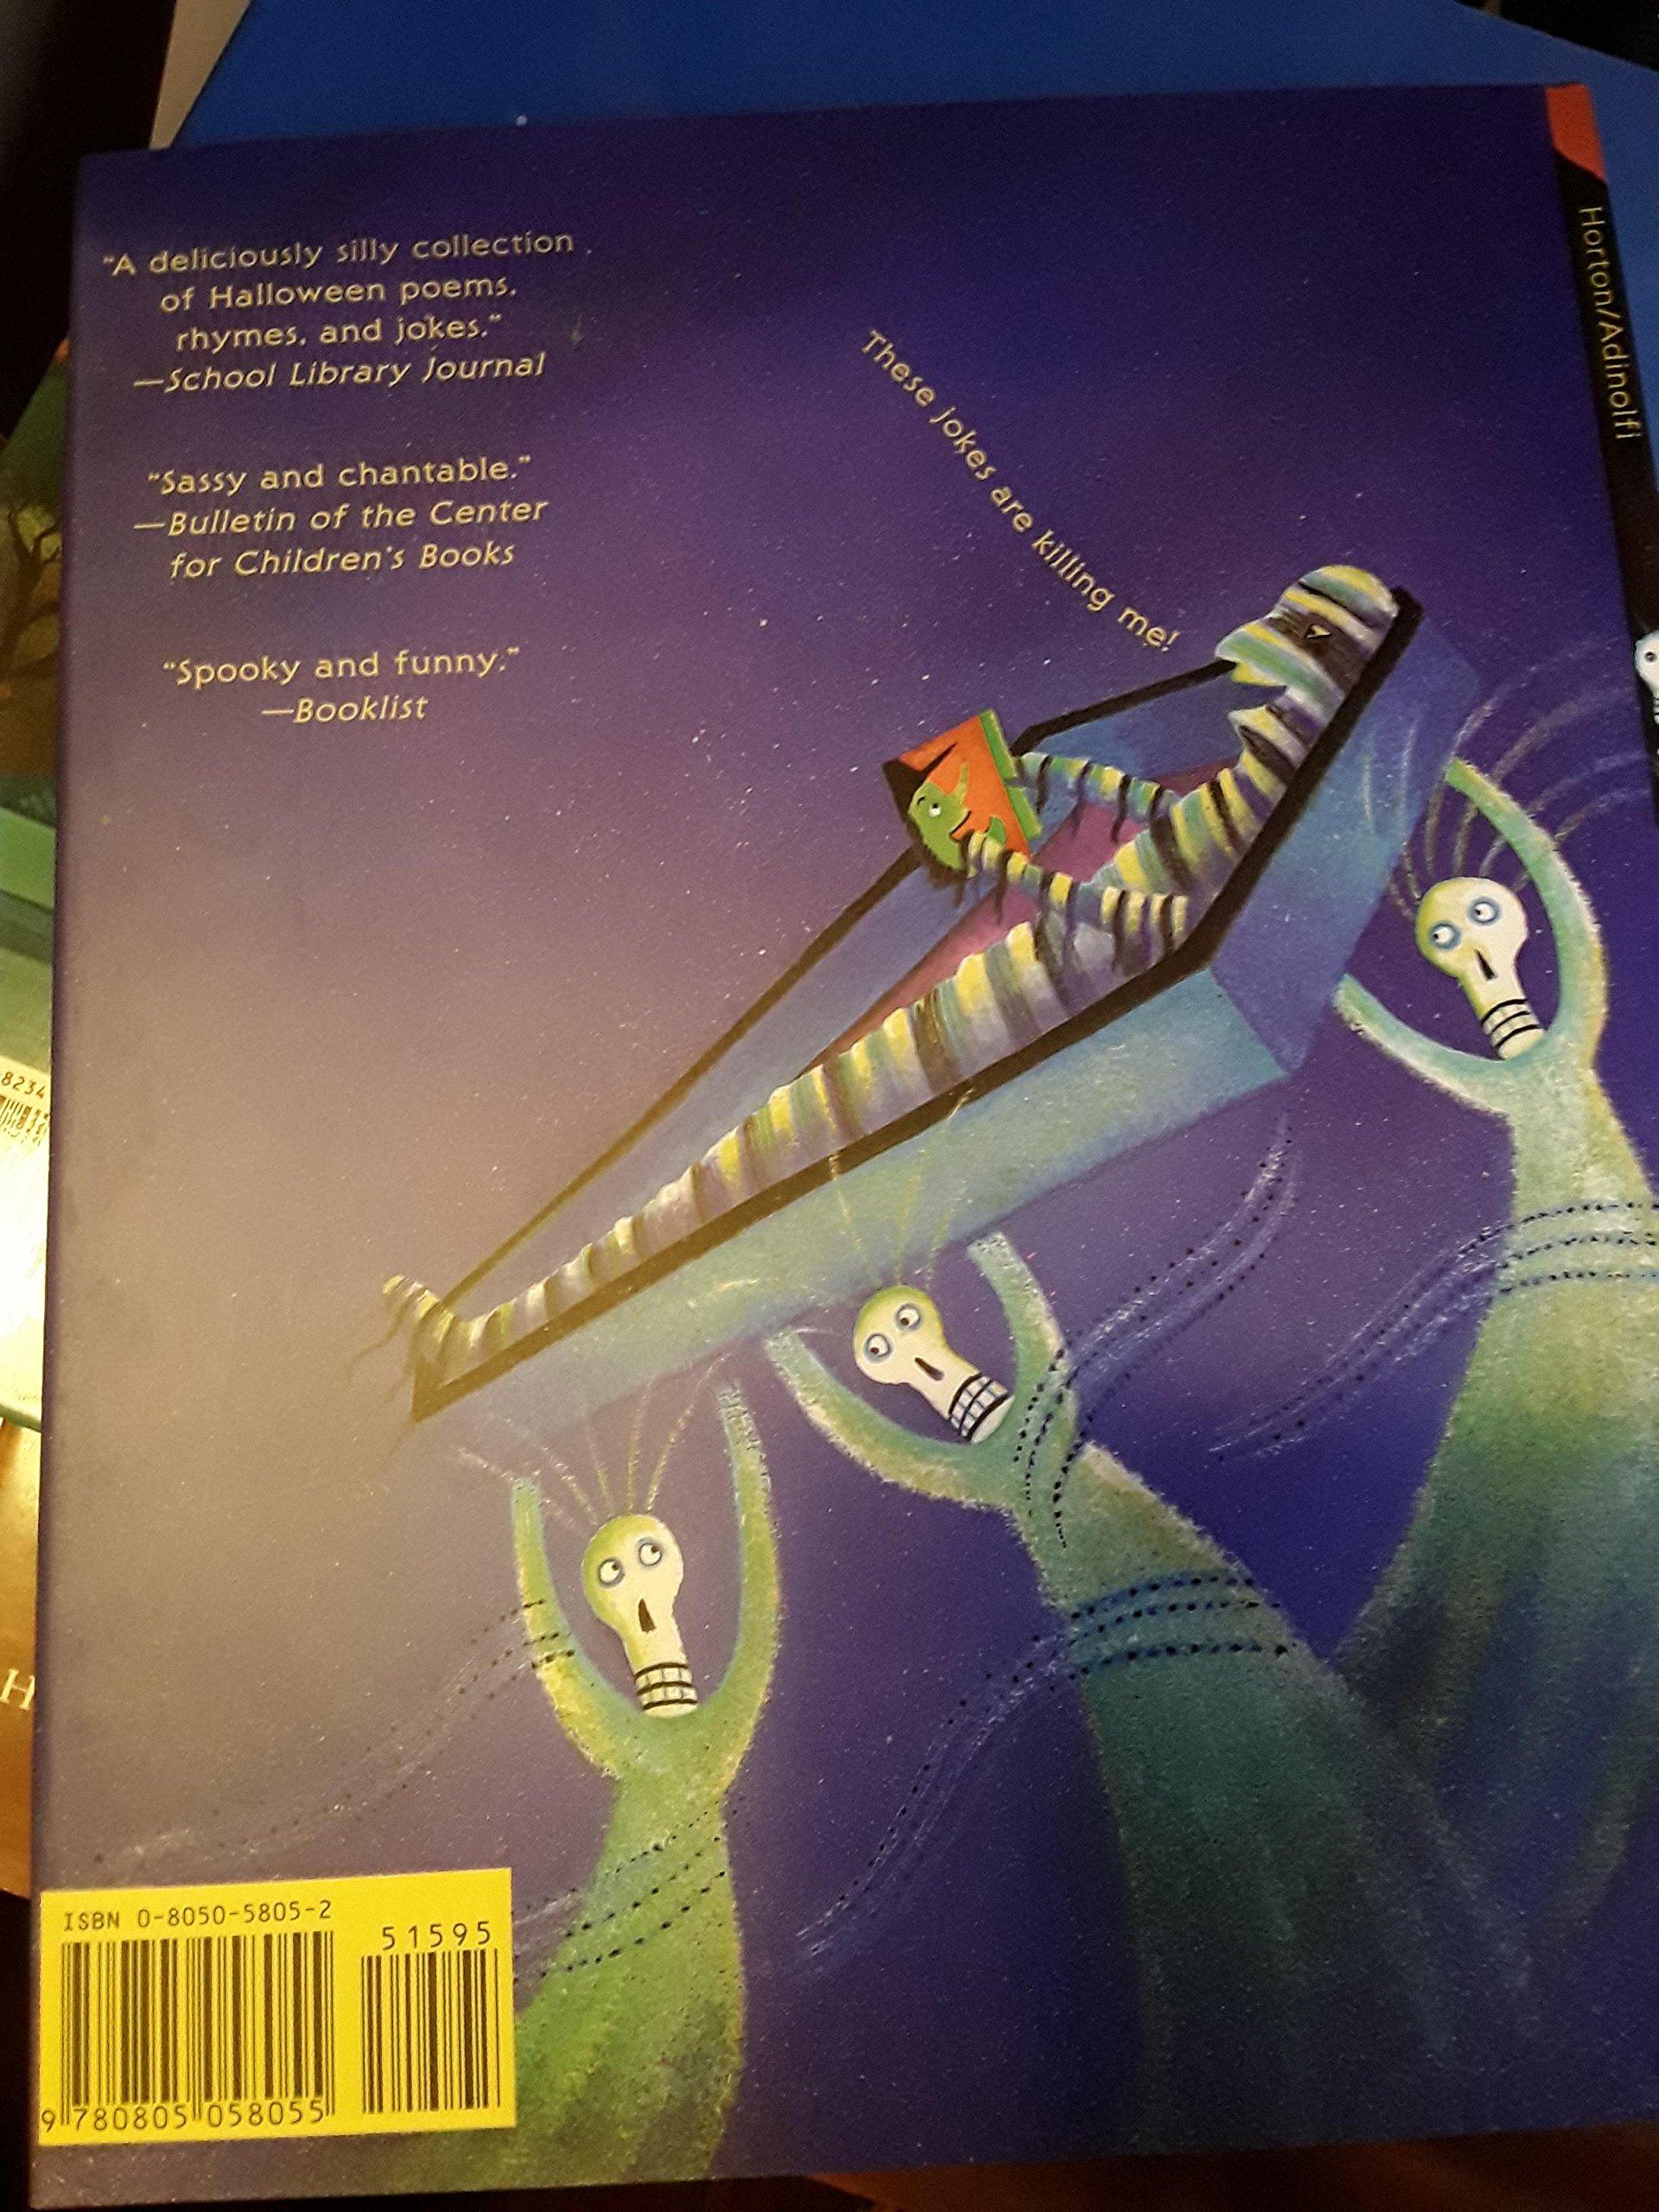 Halloween Hoots and Howls: Joan Horton, JoAnn Adinolfi: 9780805058055: Amazon.com: Books